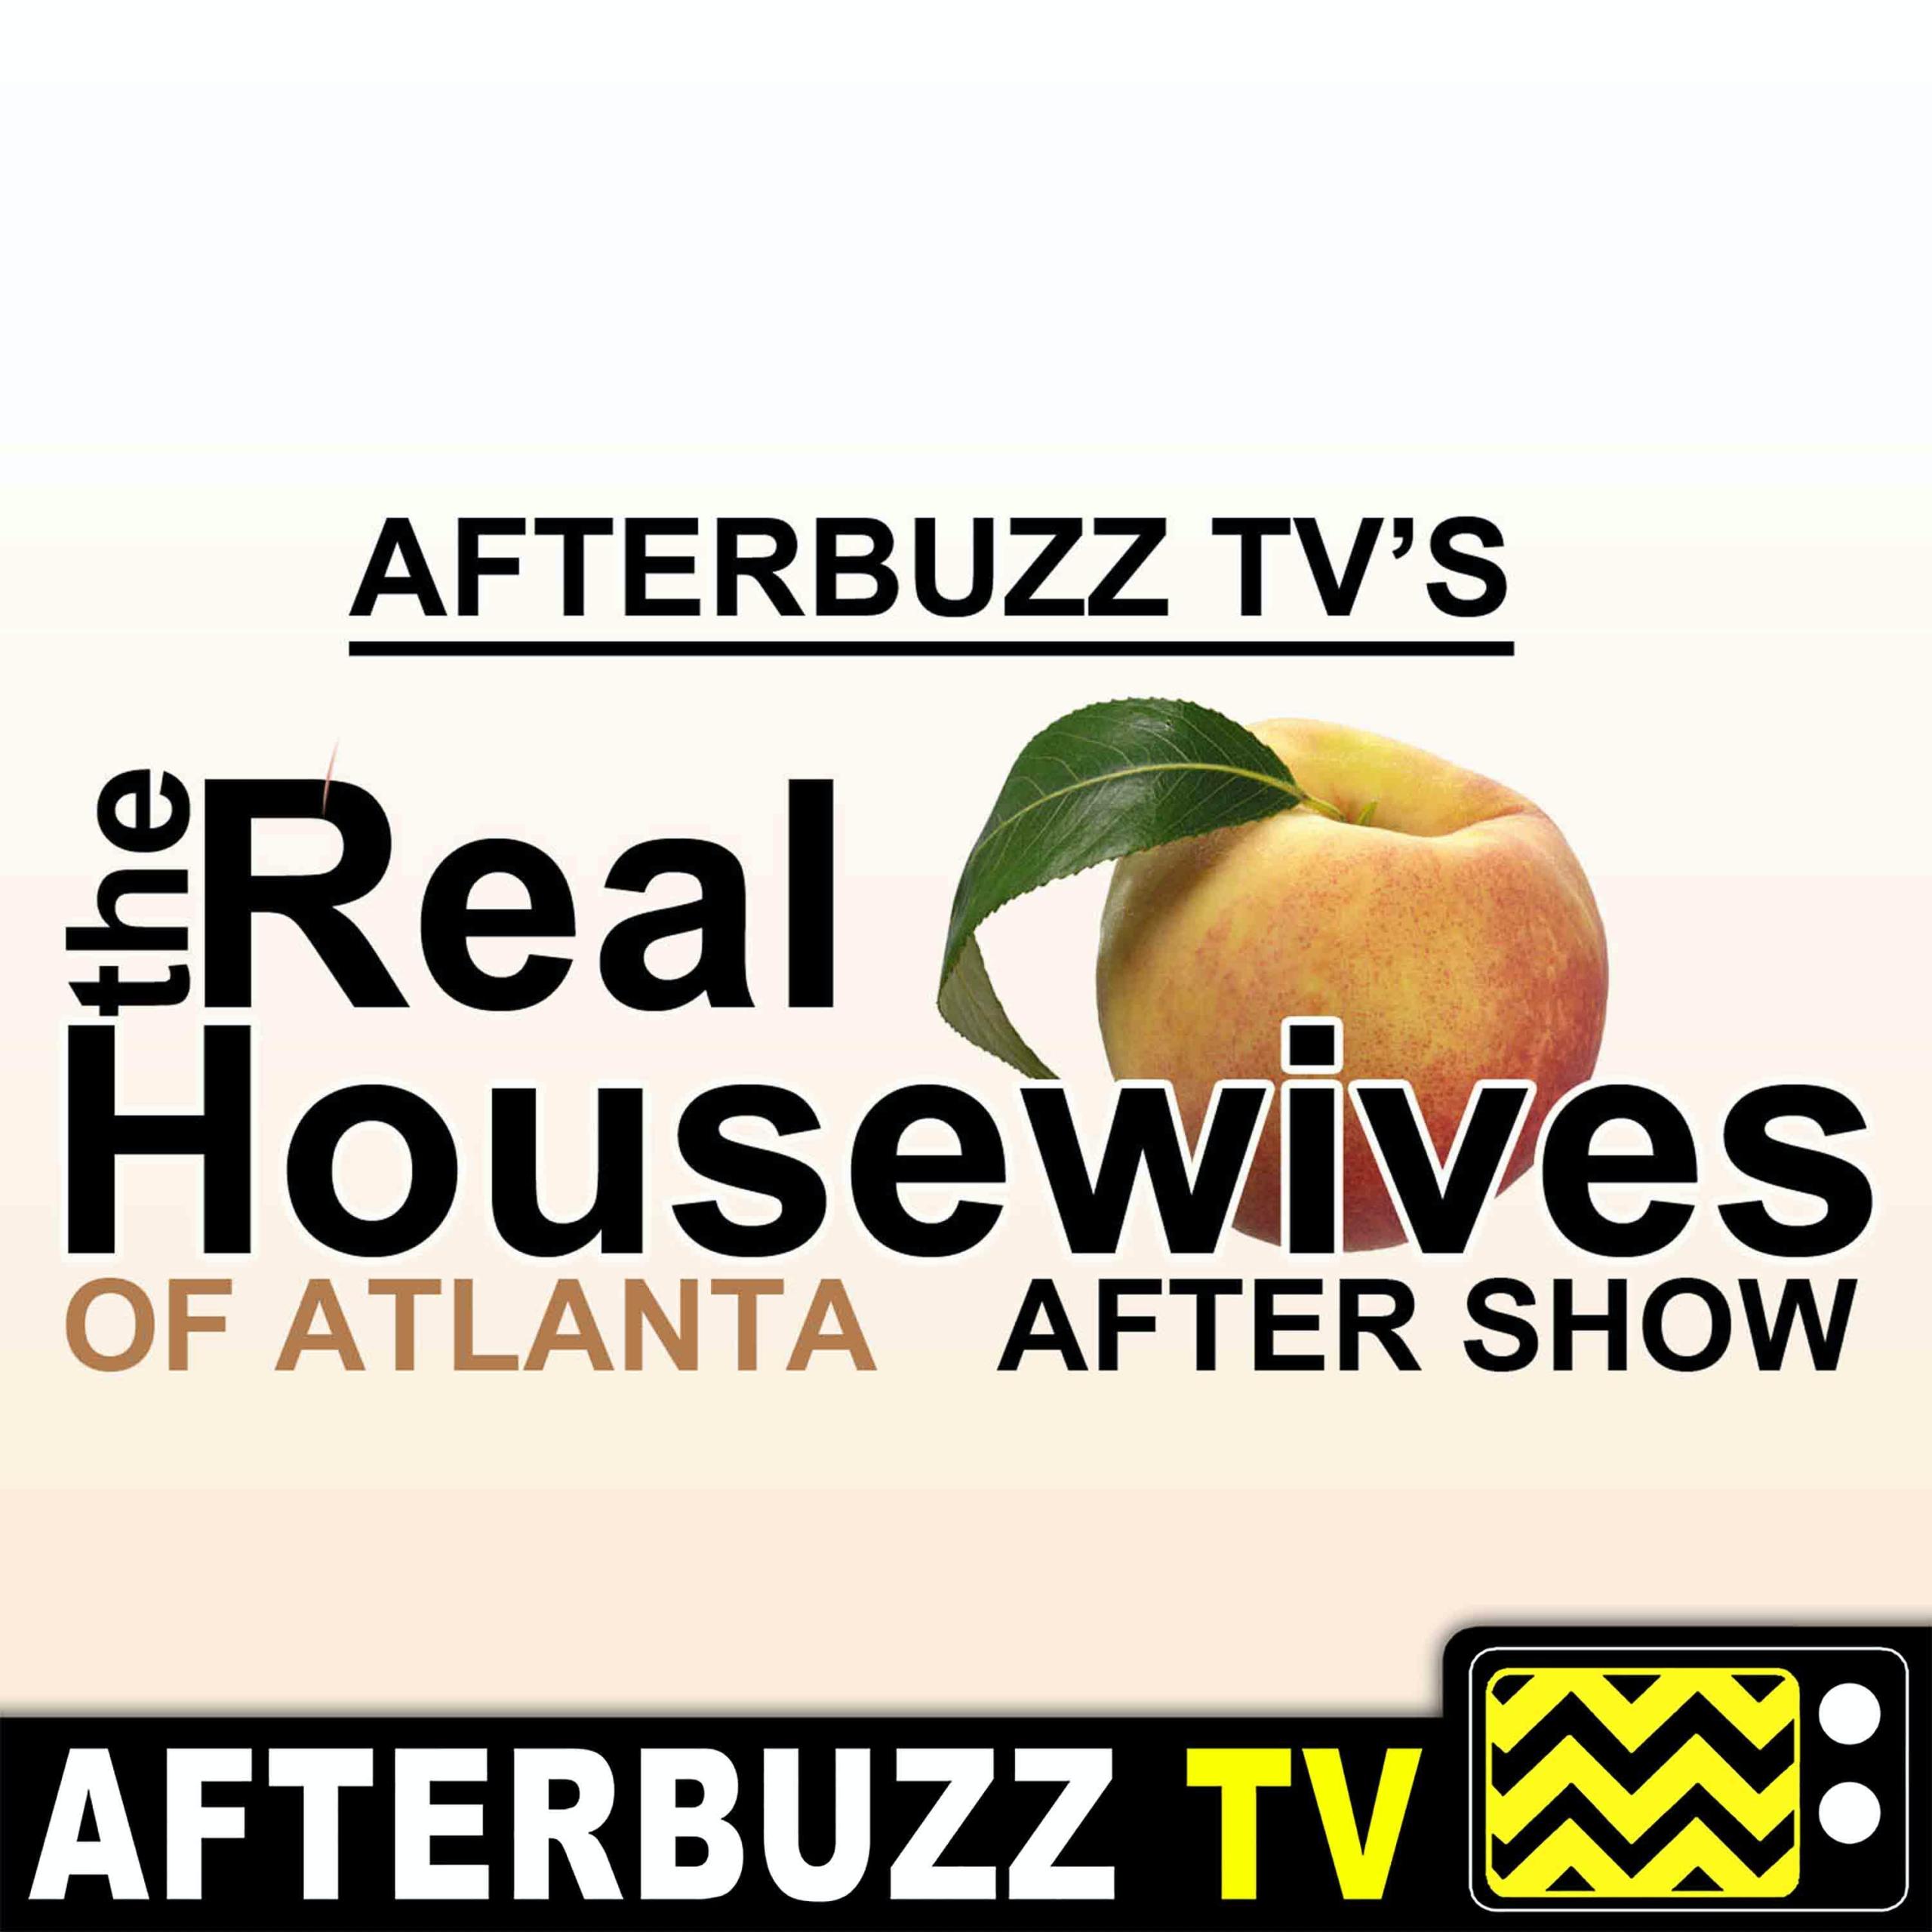 Real Housewives Of Atlanta S12 E26 Recap & After Show: Snake gate secrets revealed